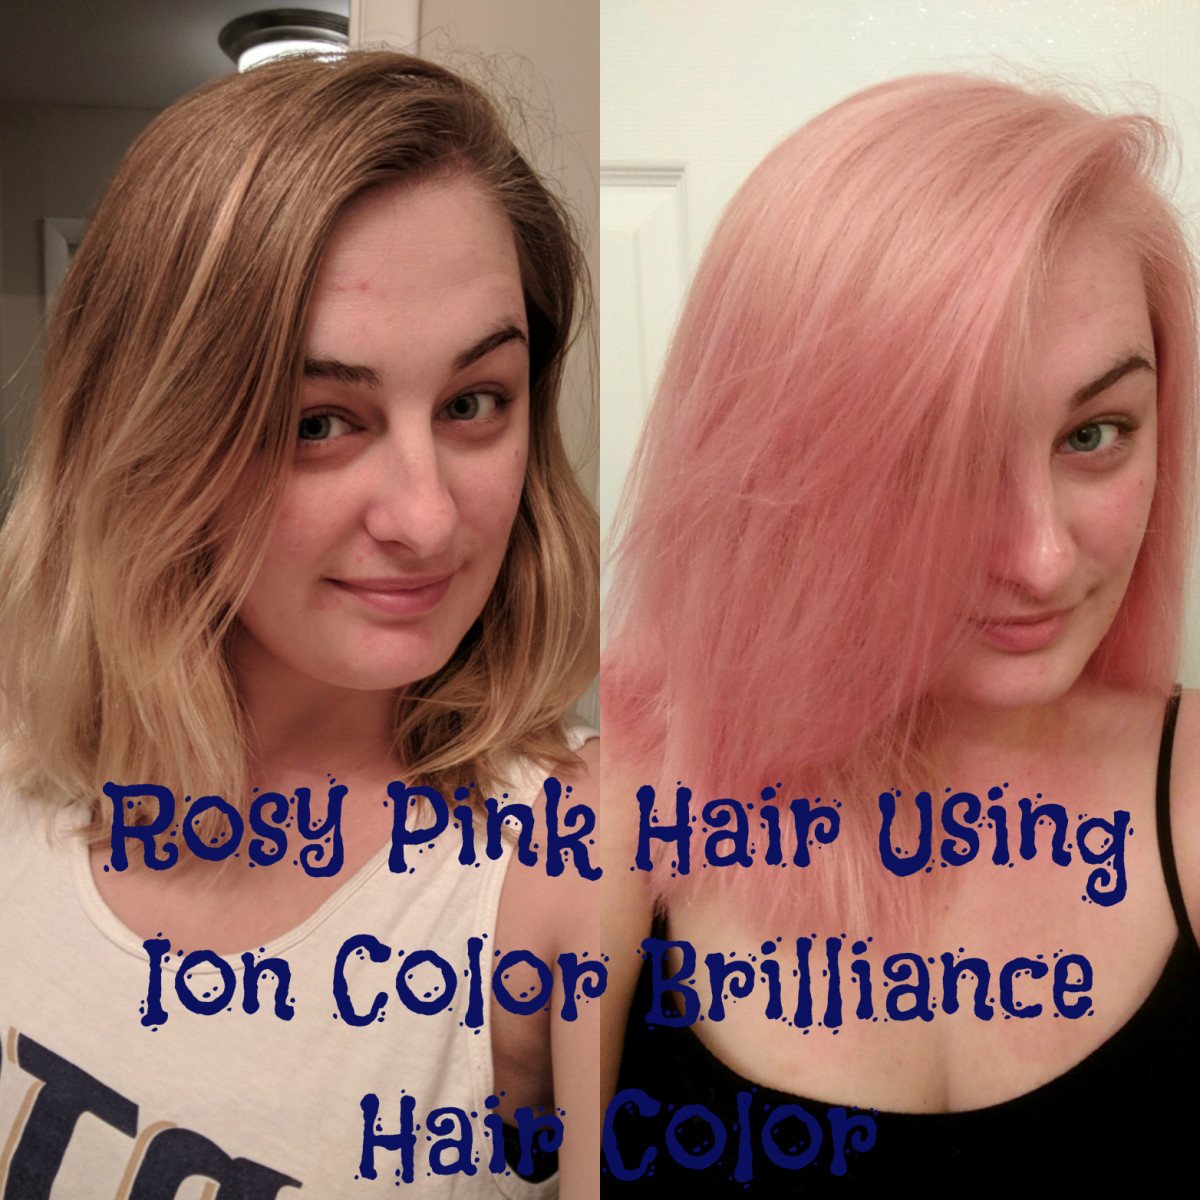 Hair Diy How To Get Rose Quartz Hair Using Ion Color Brilliance